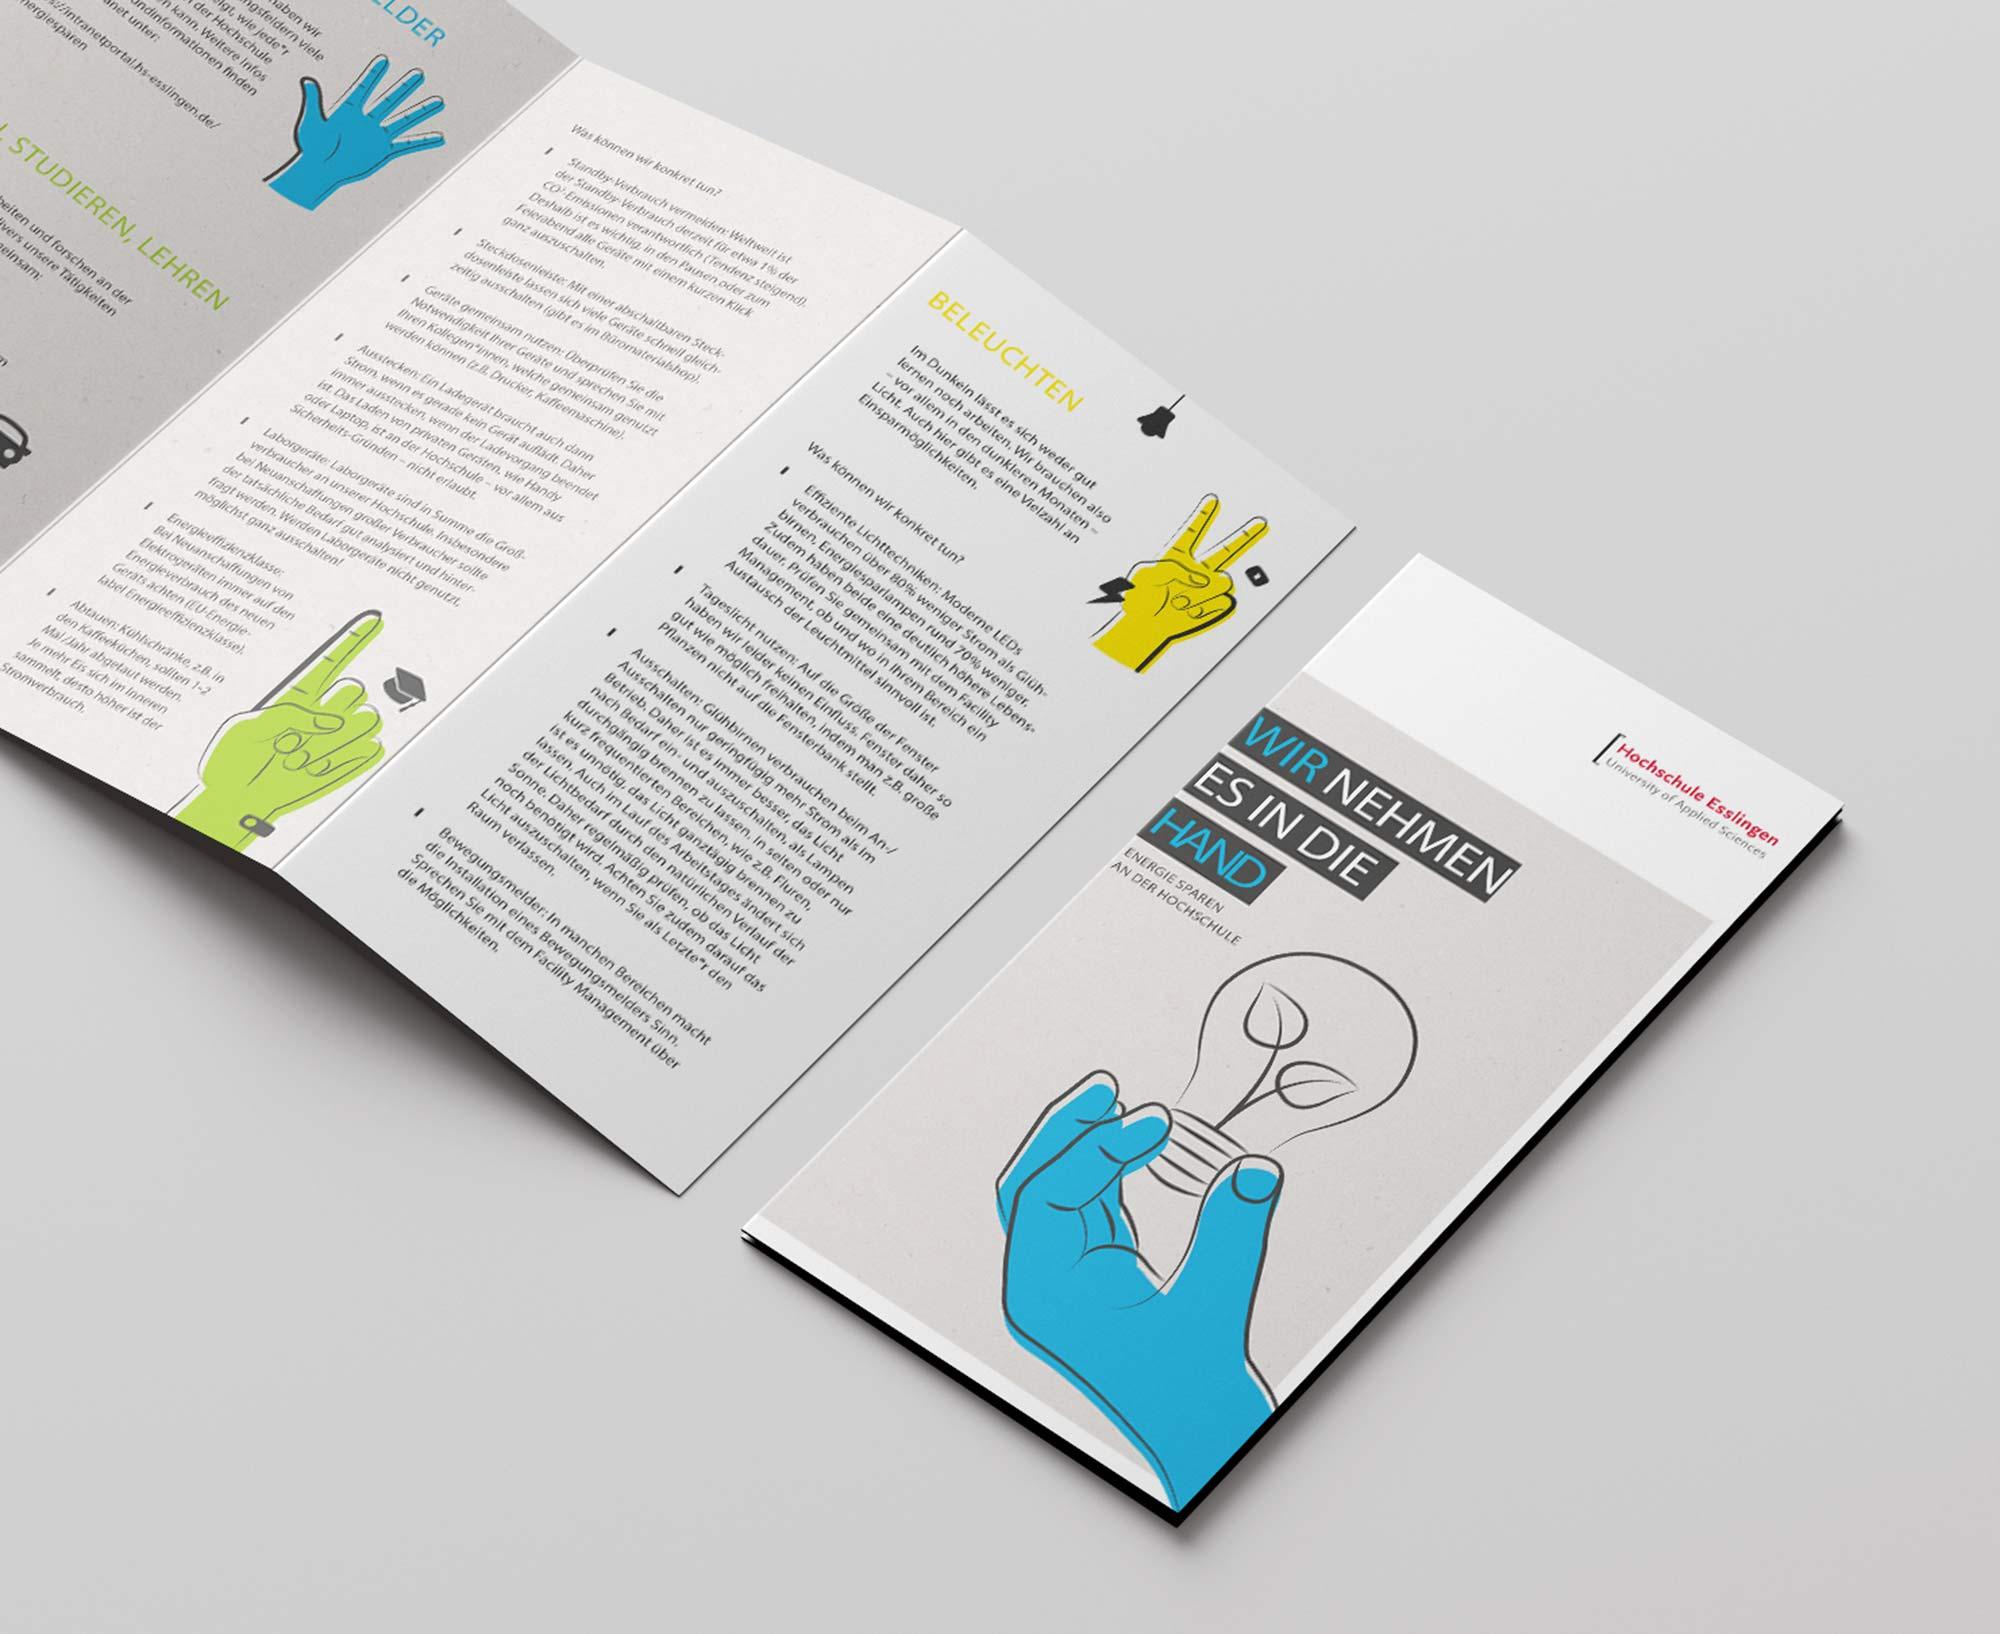 Printdesign Flyer Hochschule Esslingen Umweltkampagne